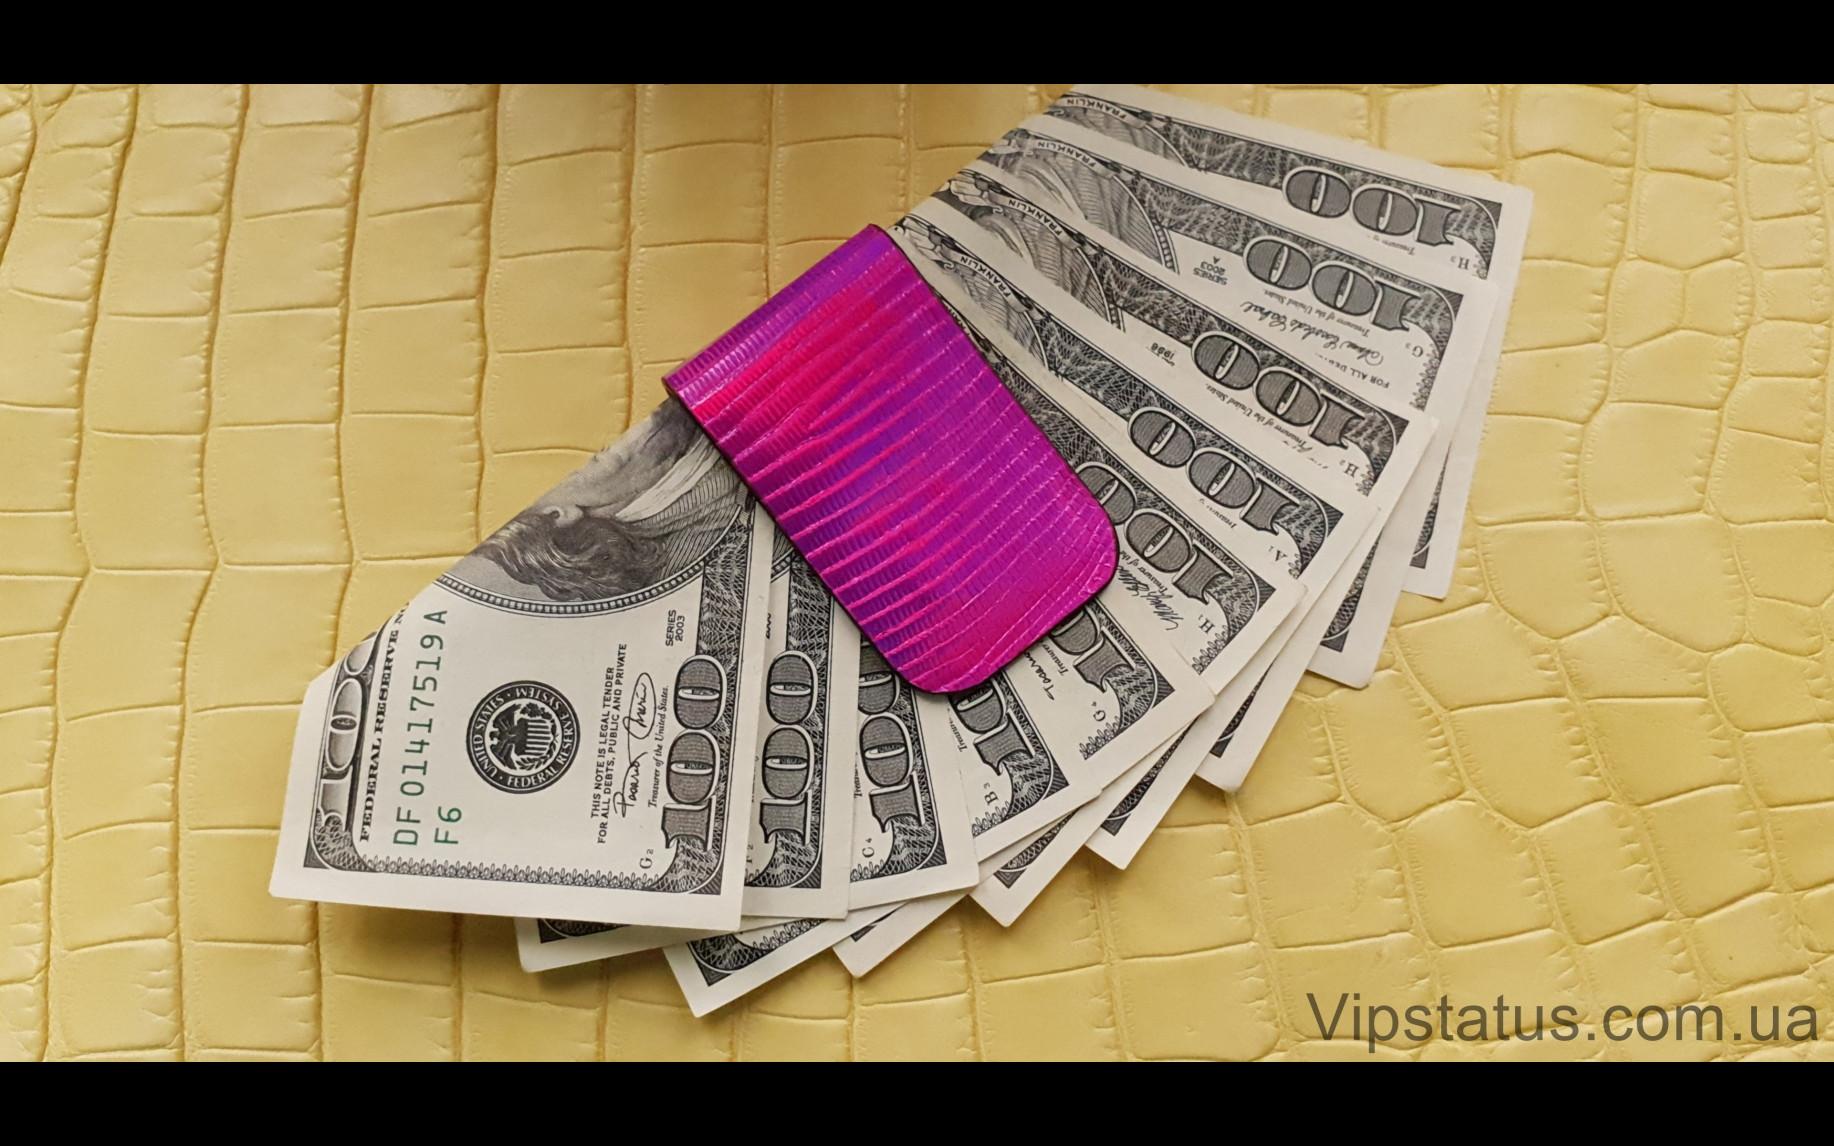 Elite Pink Rose Лакшери зажим для купюр Pink Rose Luxury bill clip image 3